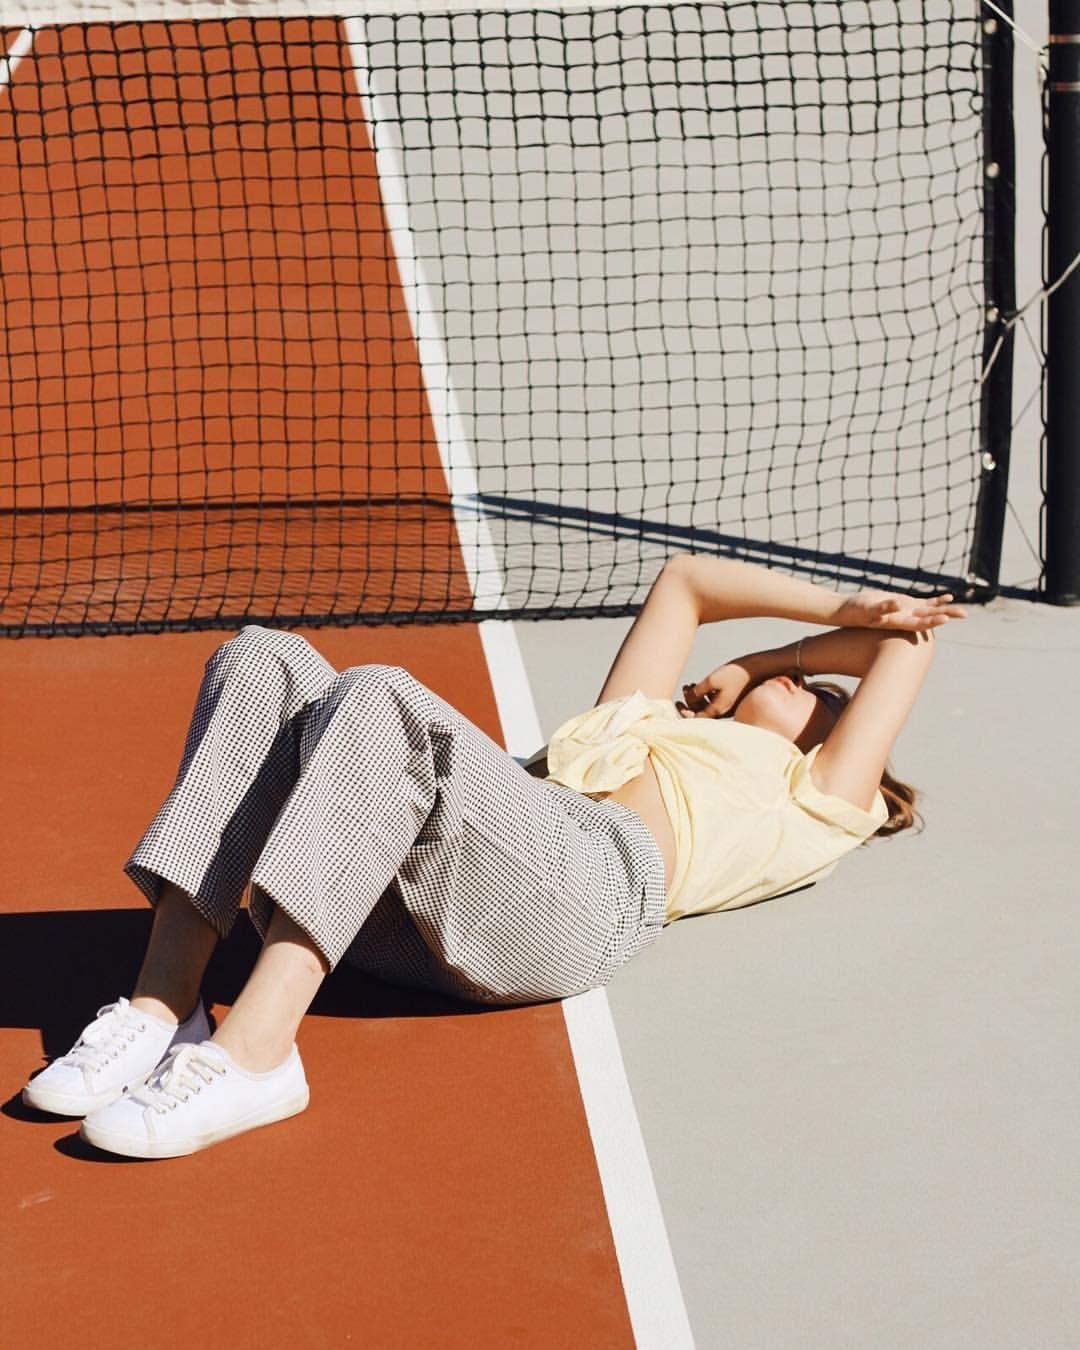 Shealynnault Tennis Court Hangs Artofvisuals Followthevision Hcollective Artisticco Tennis Court Photoshoot Models Photoshoot Tennis Fashion